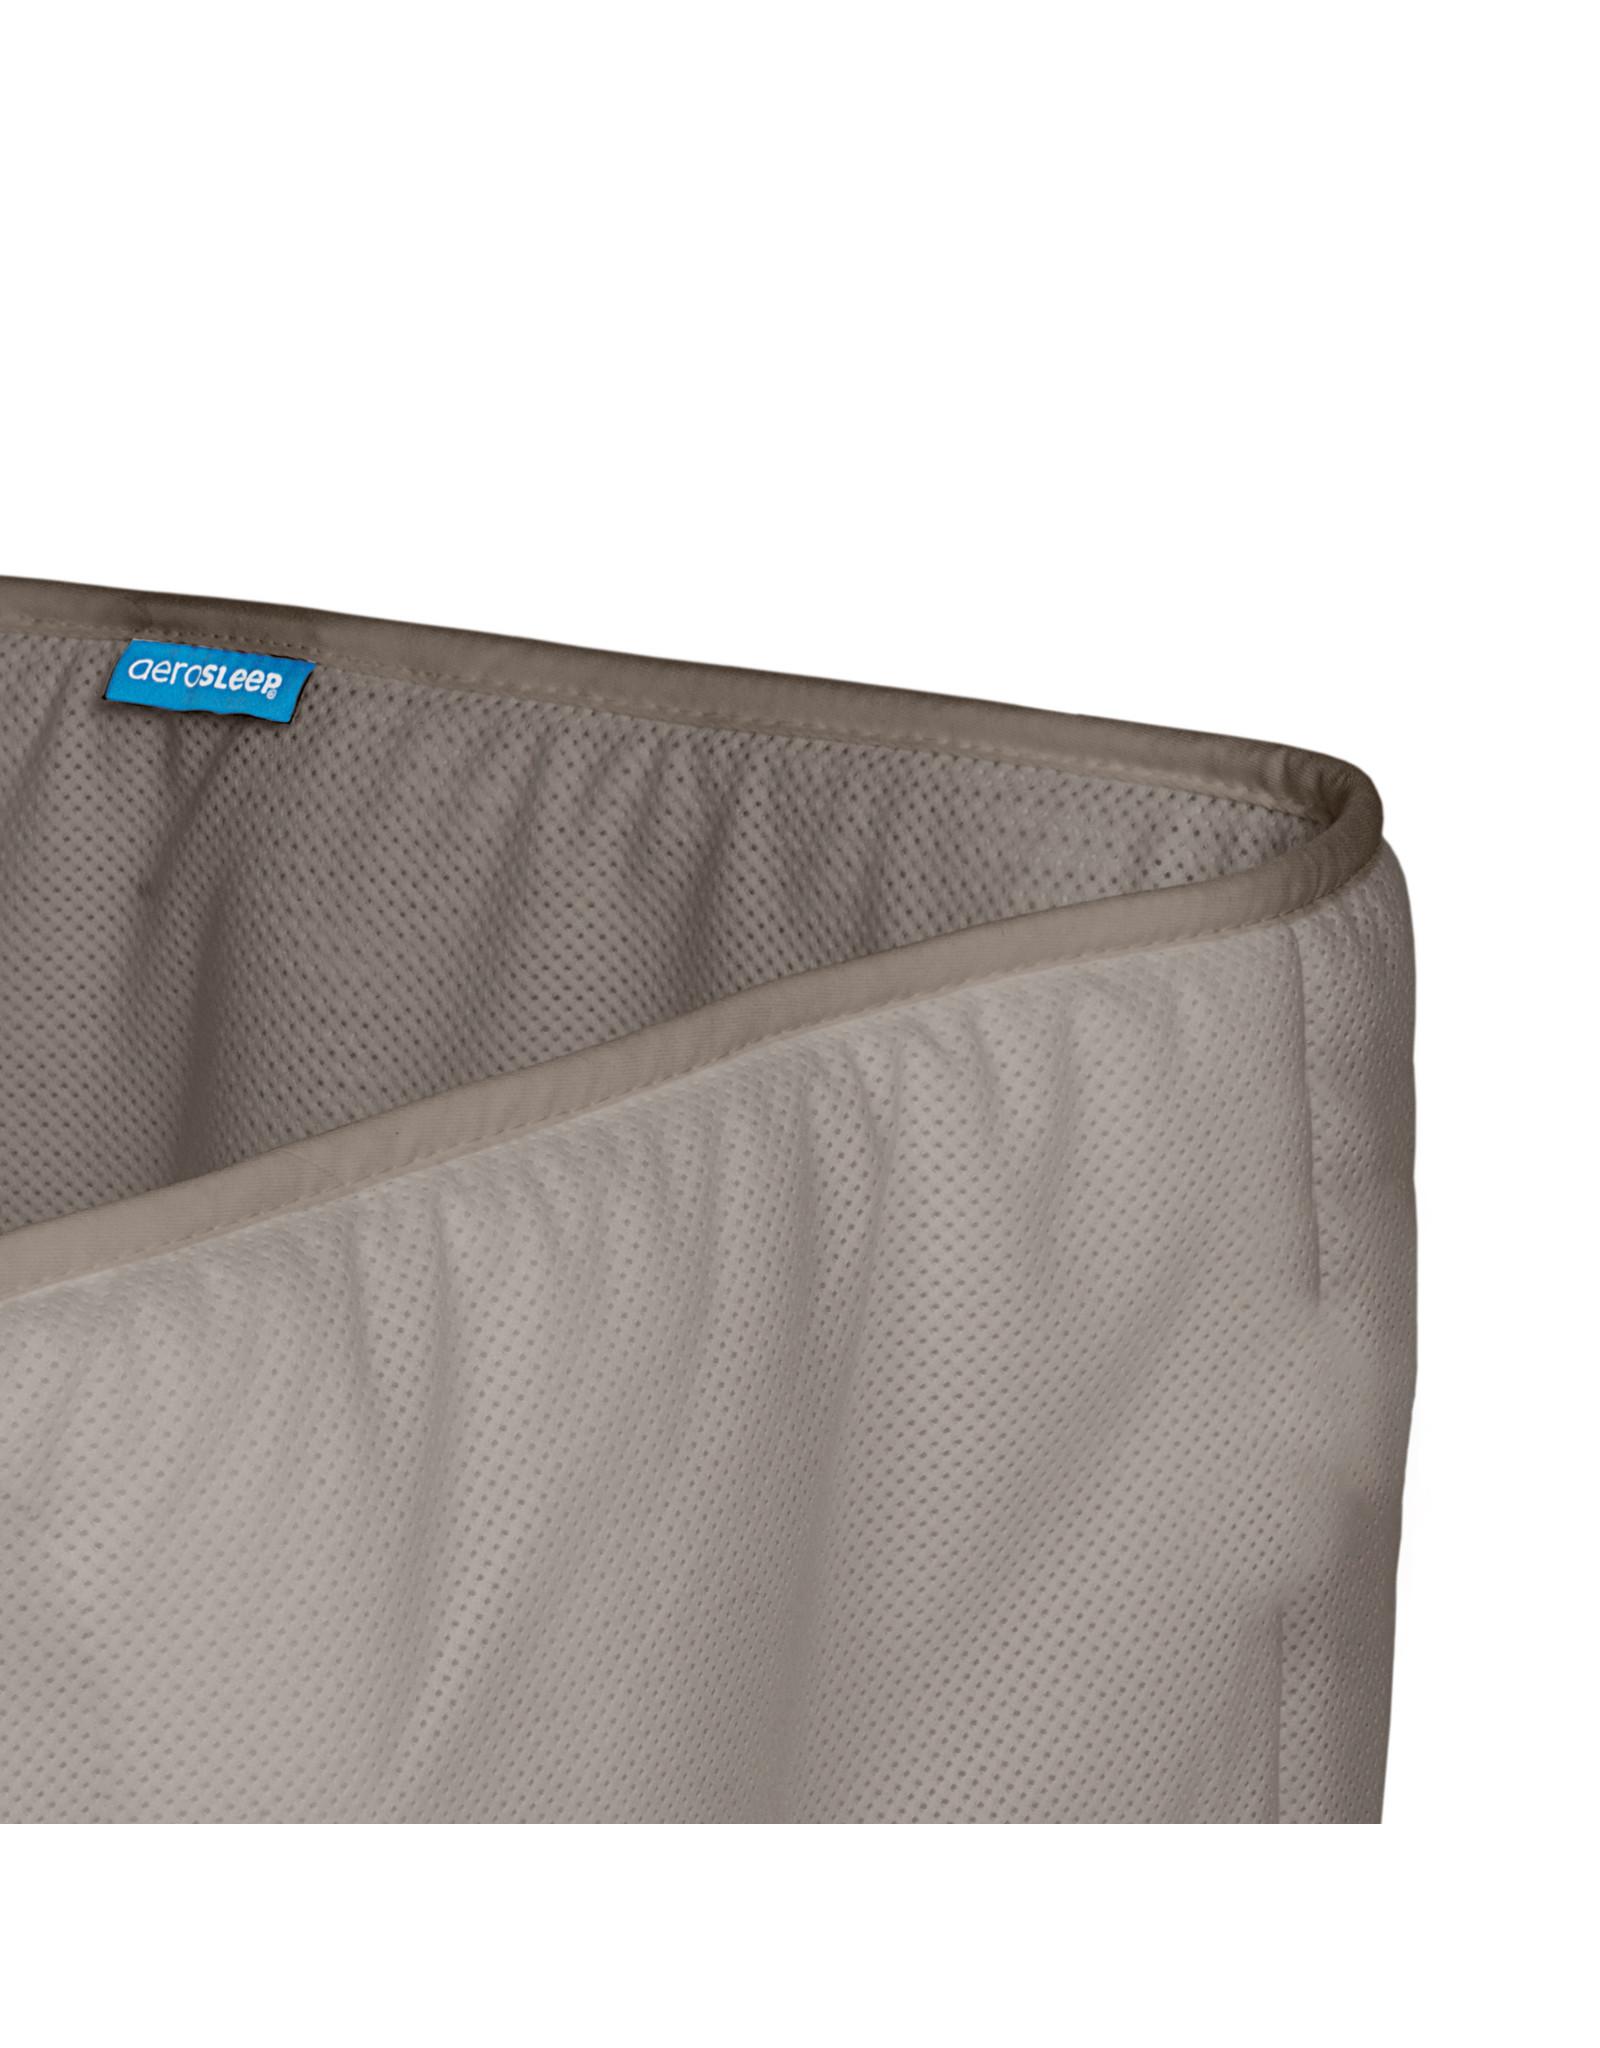 Aerosleep Aerosleep Sleep Safe Bed Bumper: 60-120cm en 70-140cm Grijs